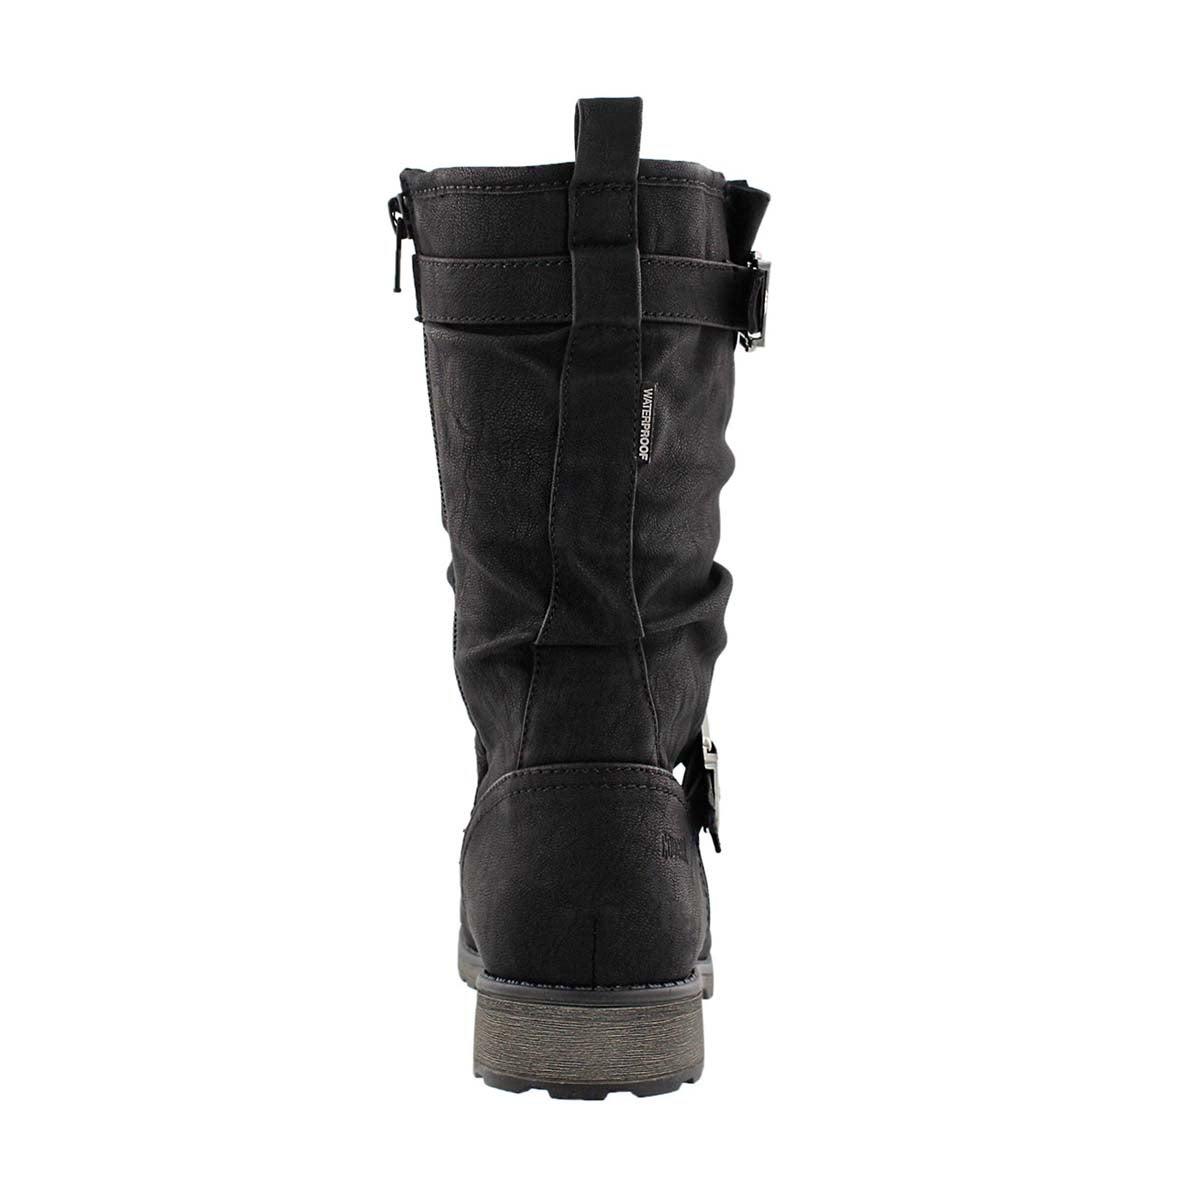 Grls Nota blk wpf mid calf boot